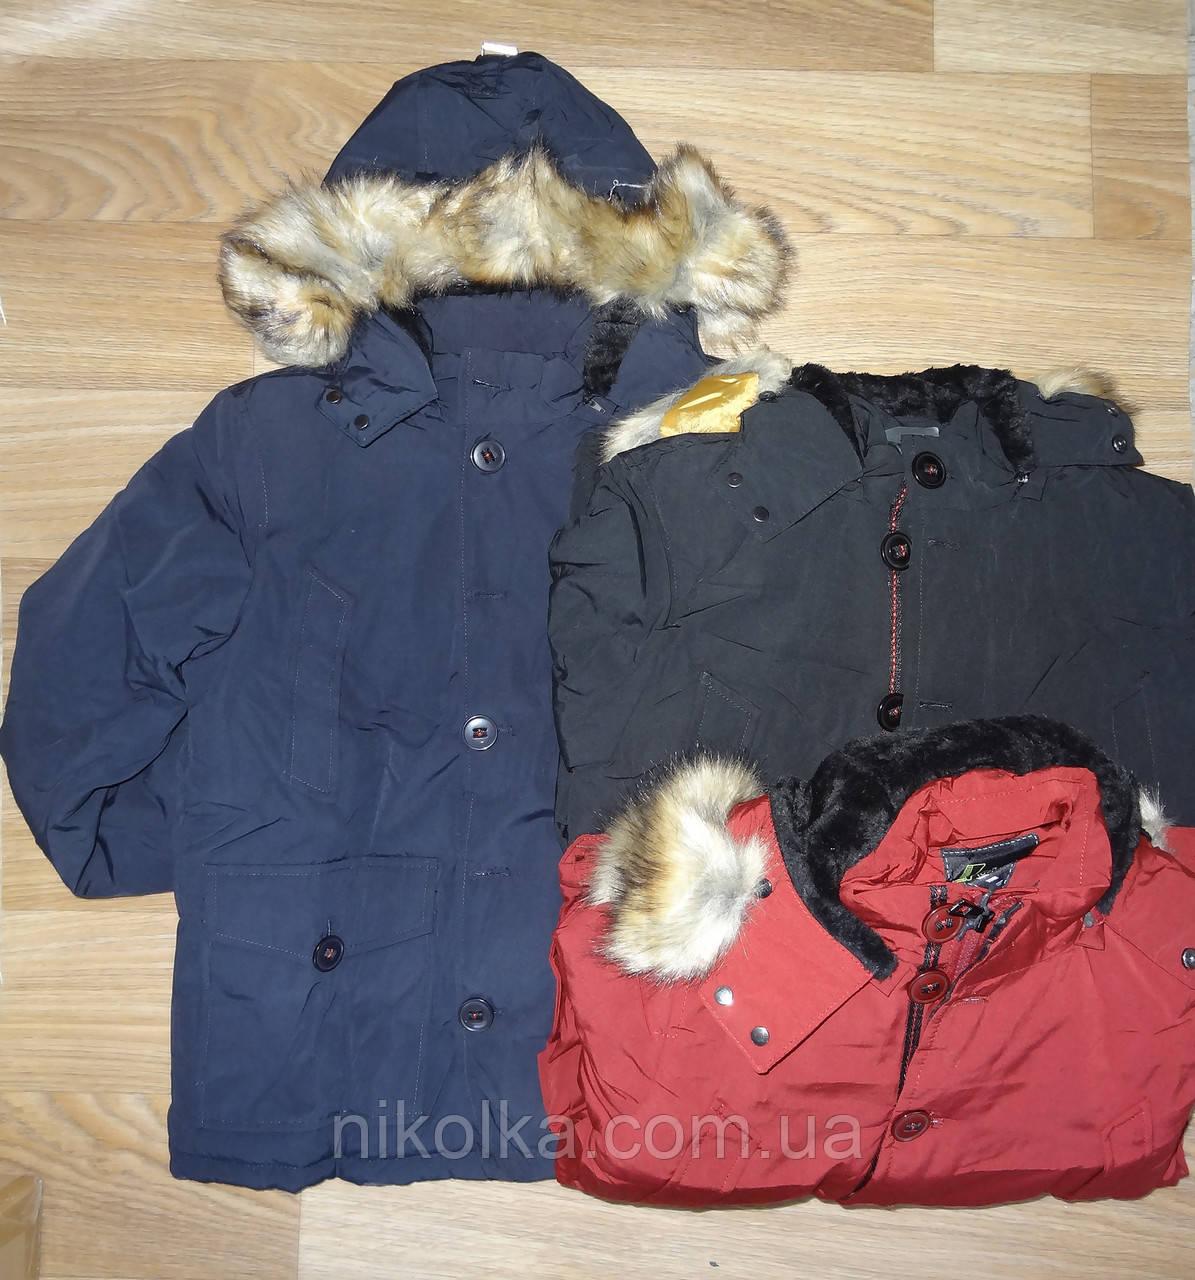 e28188674f4 Куртки для мальчика оптом